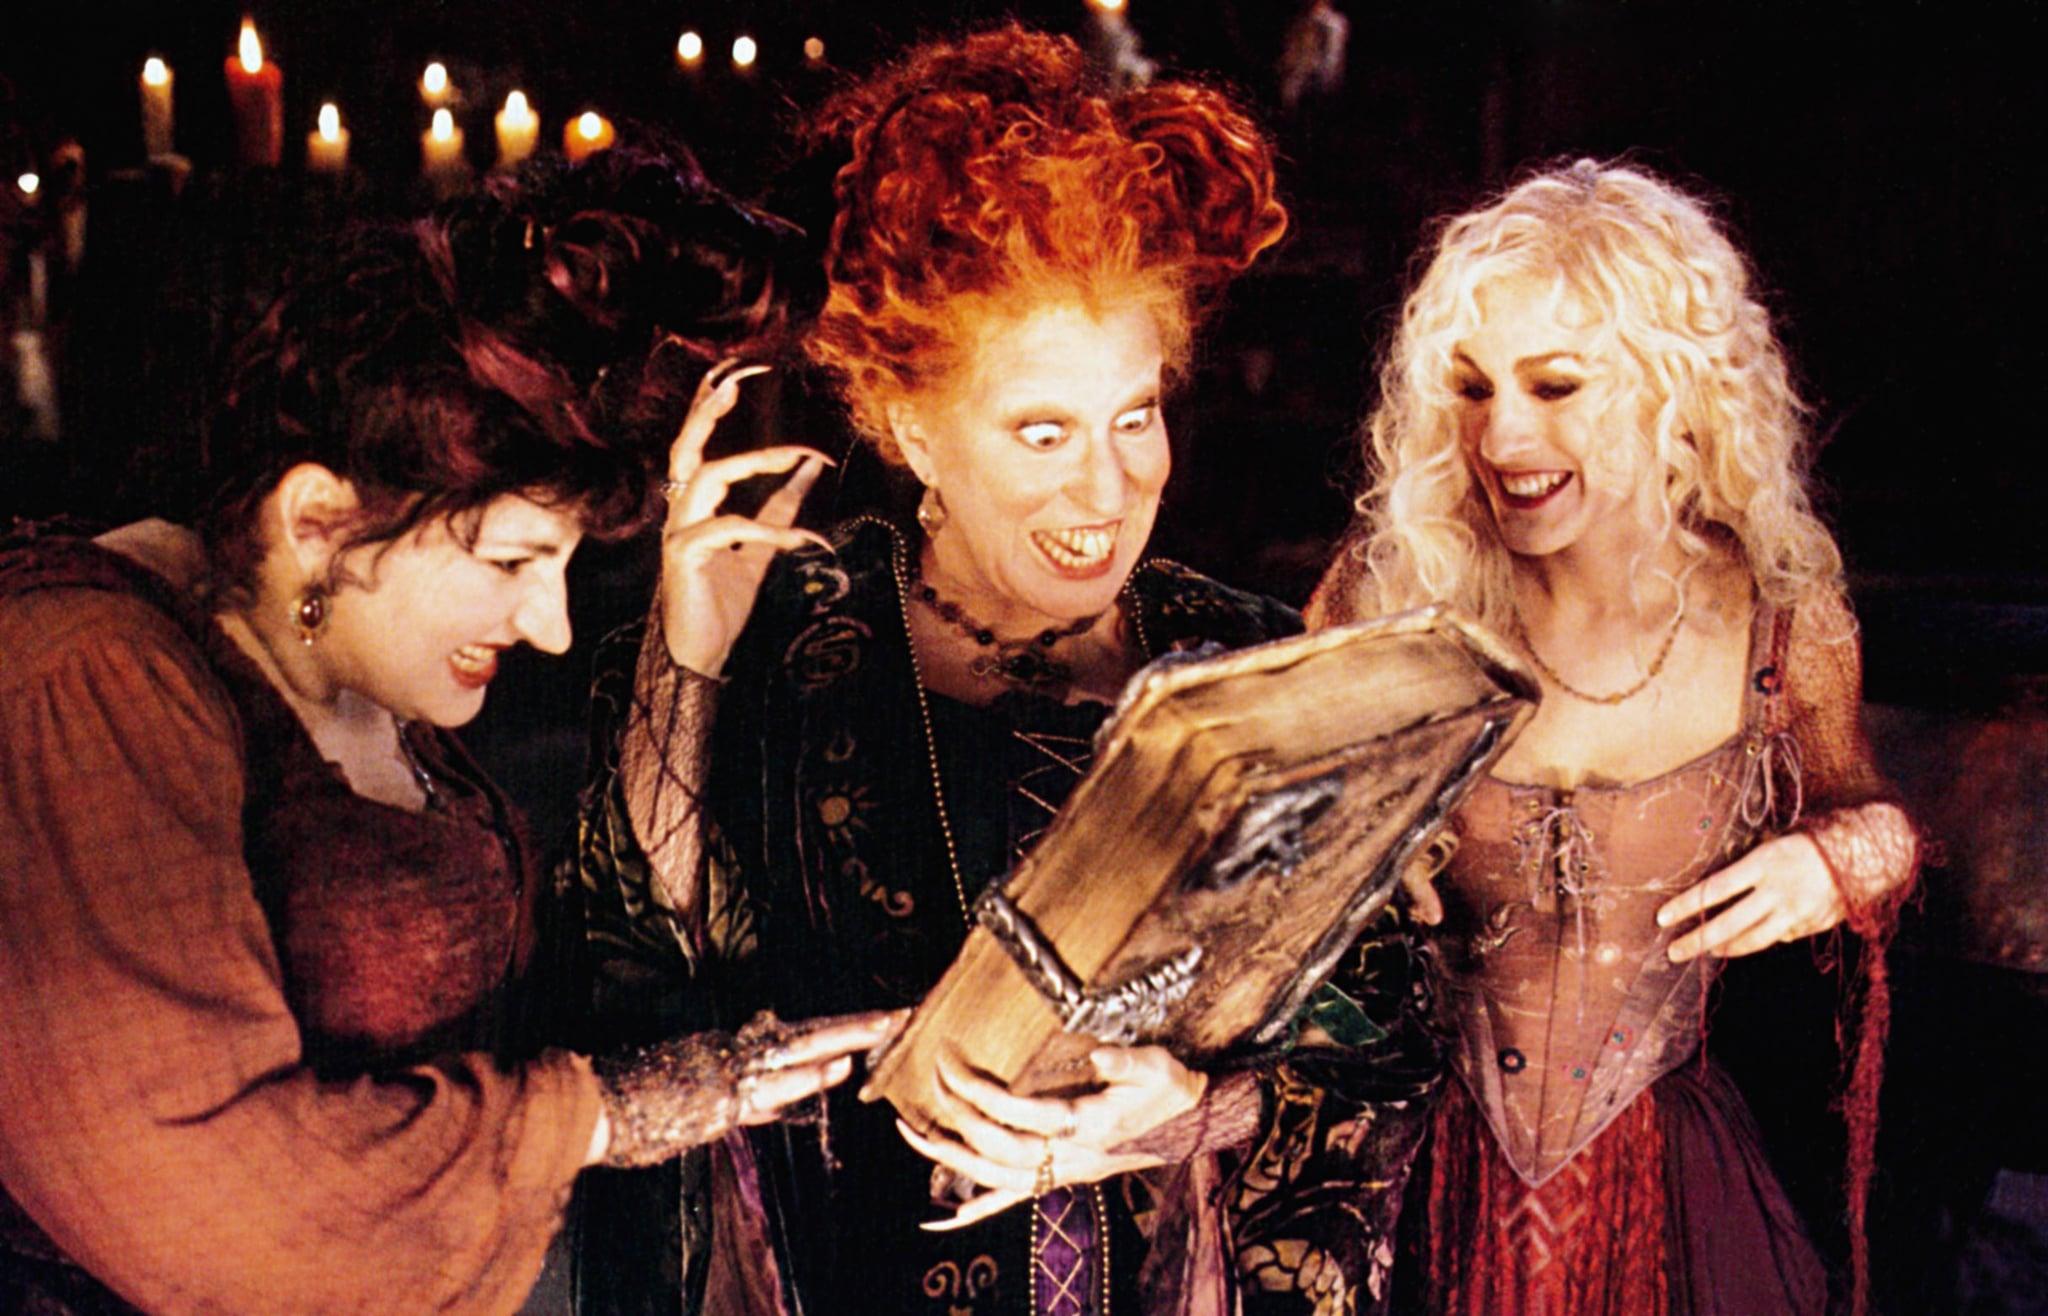 HOCUS POCUS, from left: Kathy Najimy, Bette Midler, Sarah Jessica Parker, 1993,  Buena Vista/courtesy Everett Collection